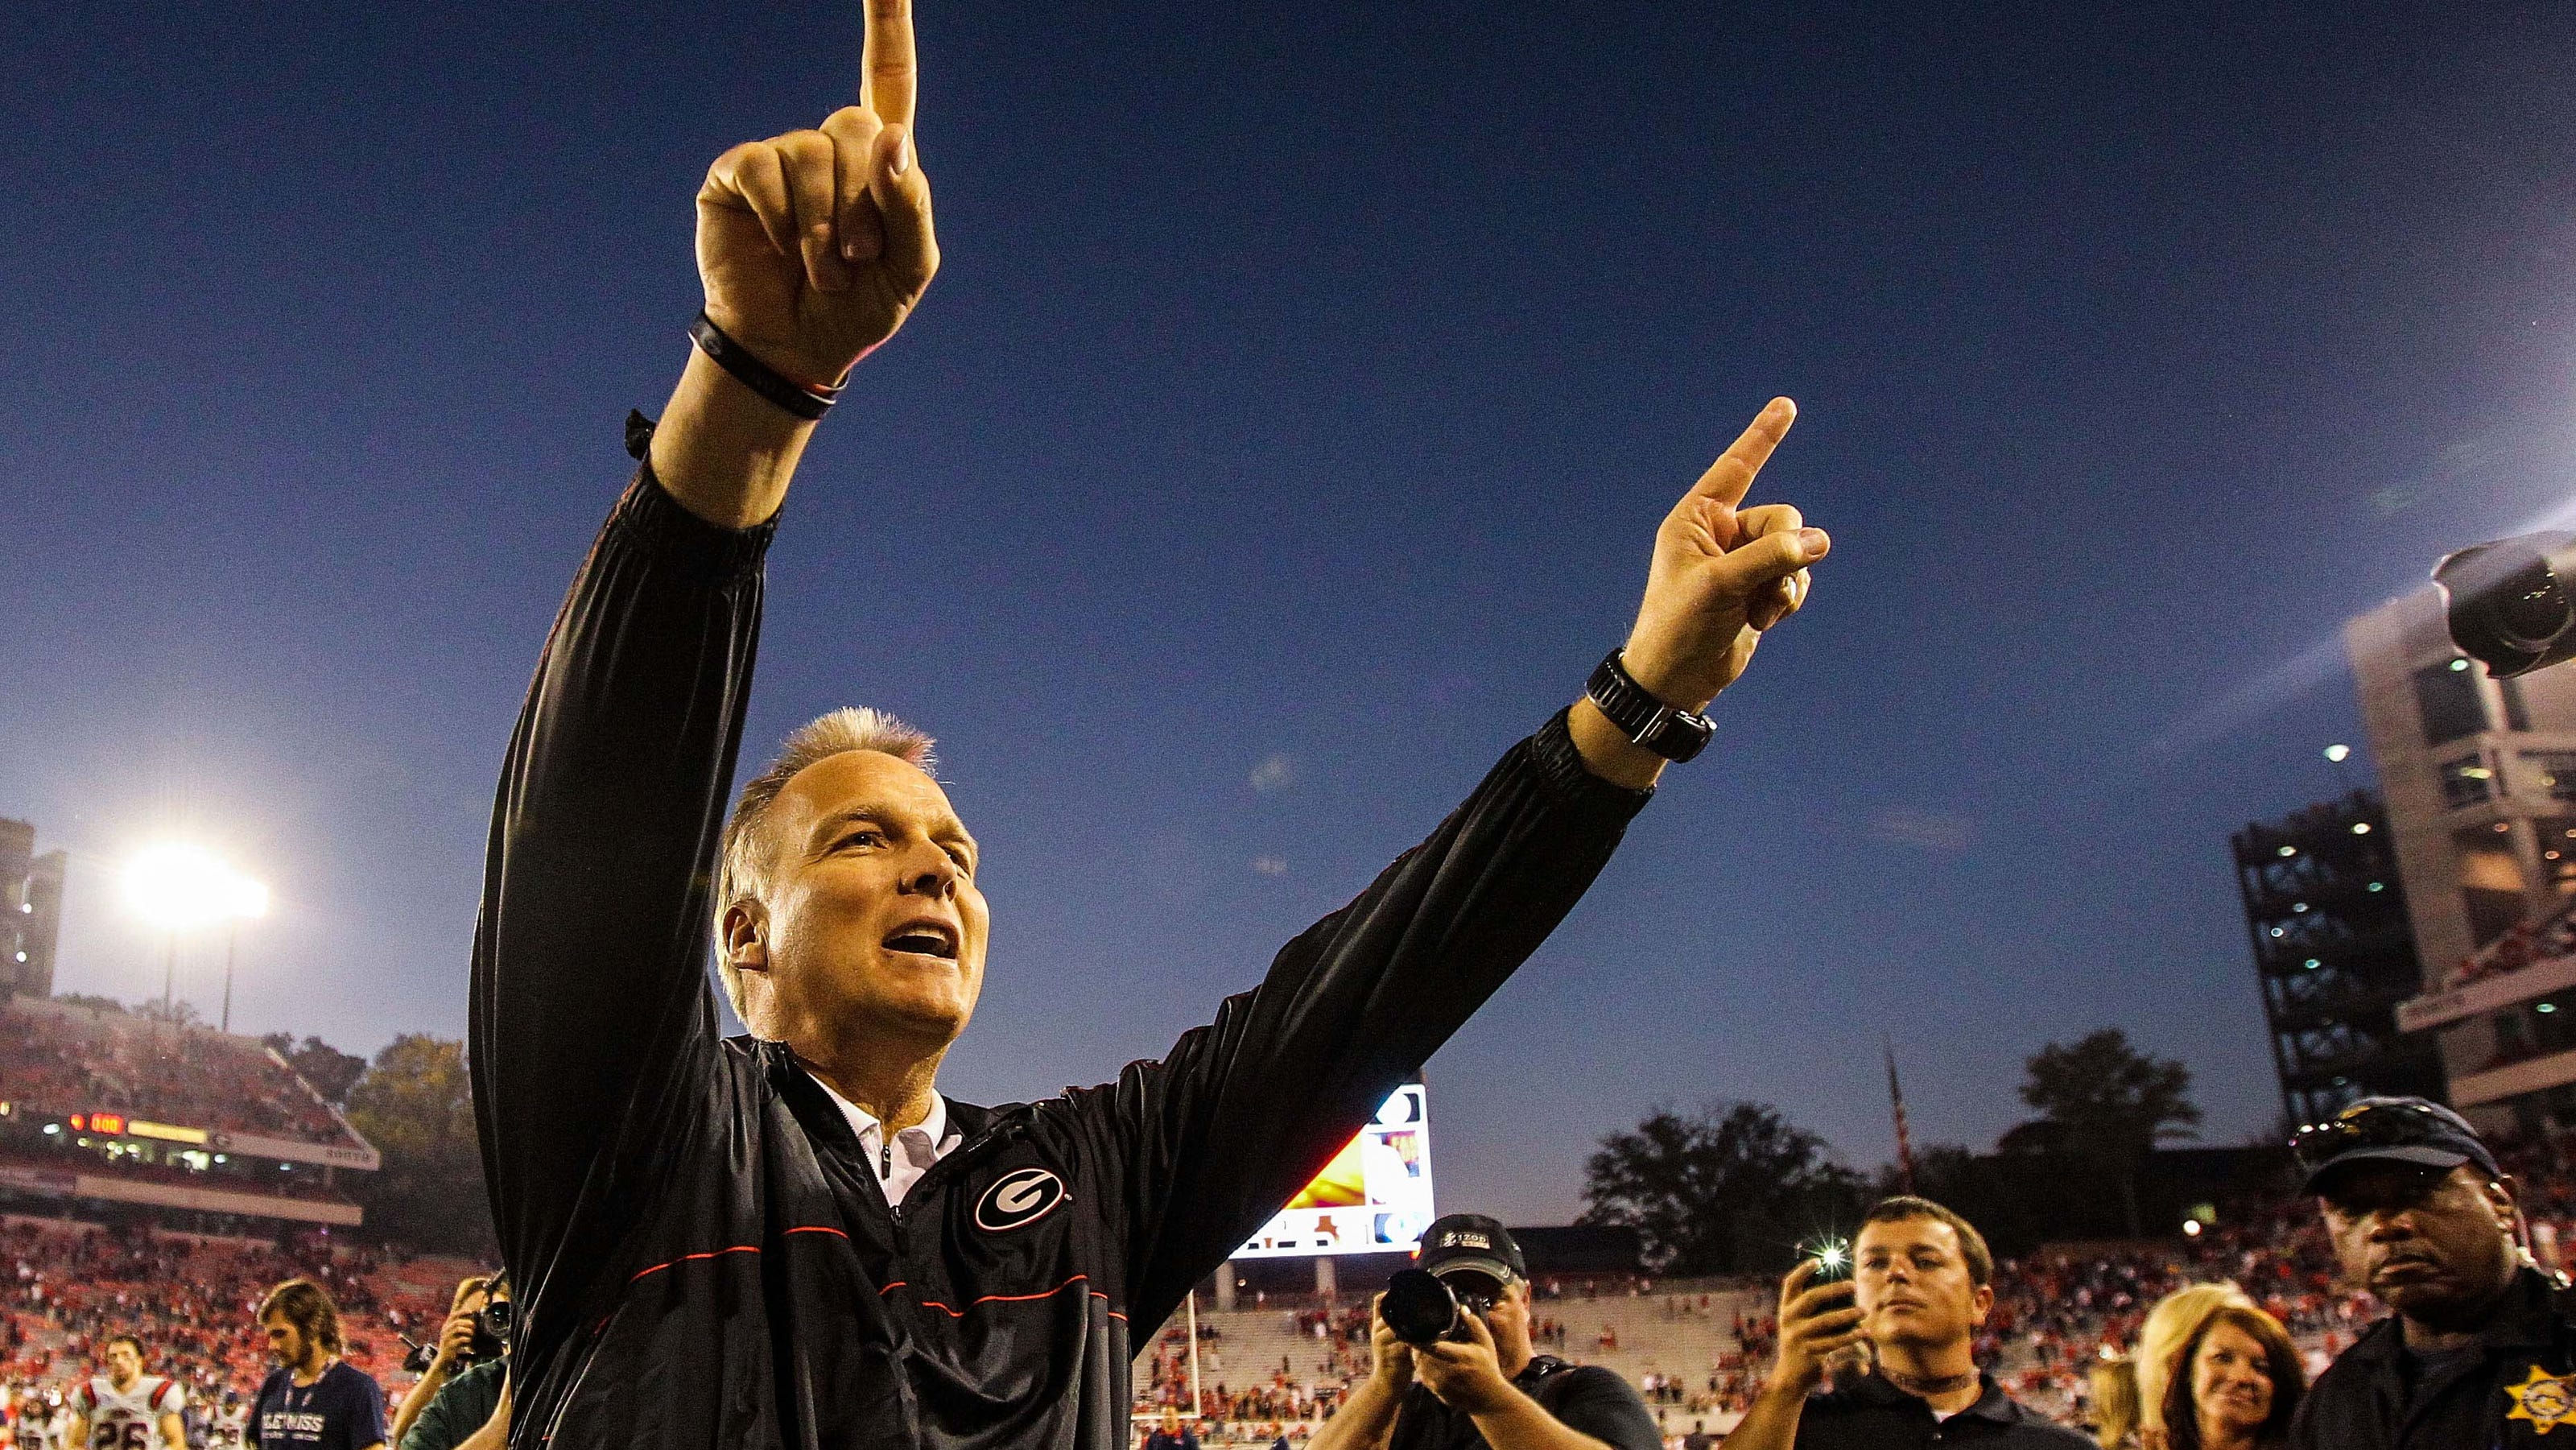 Former UGA football coach Mark Richt diagnosed with Parkinson's Disease